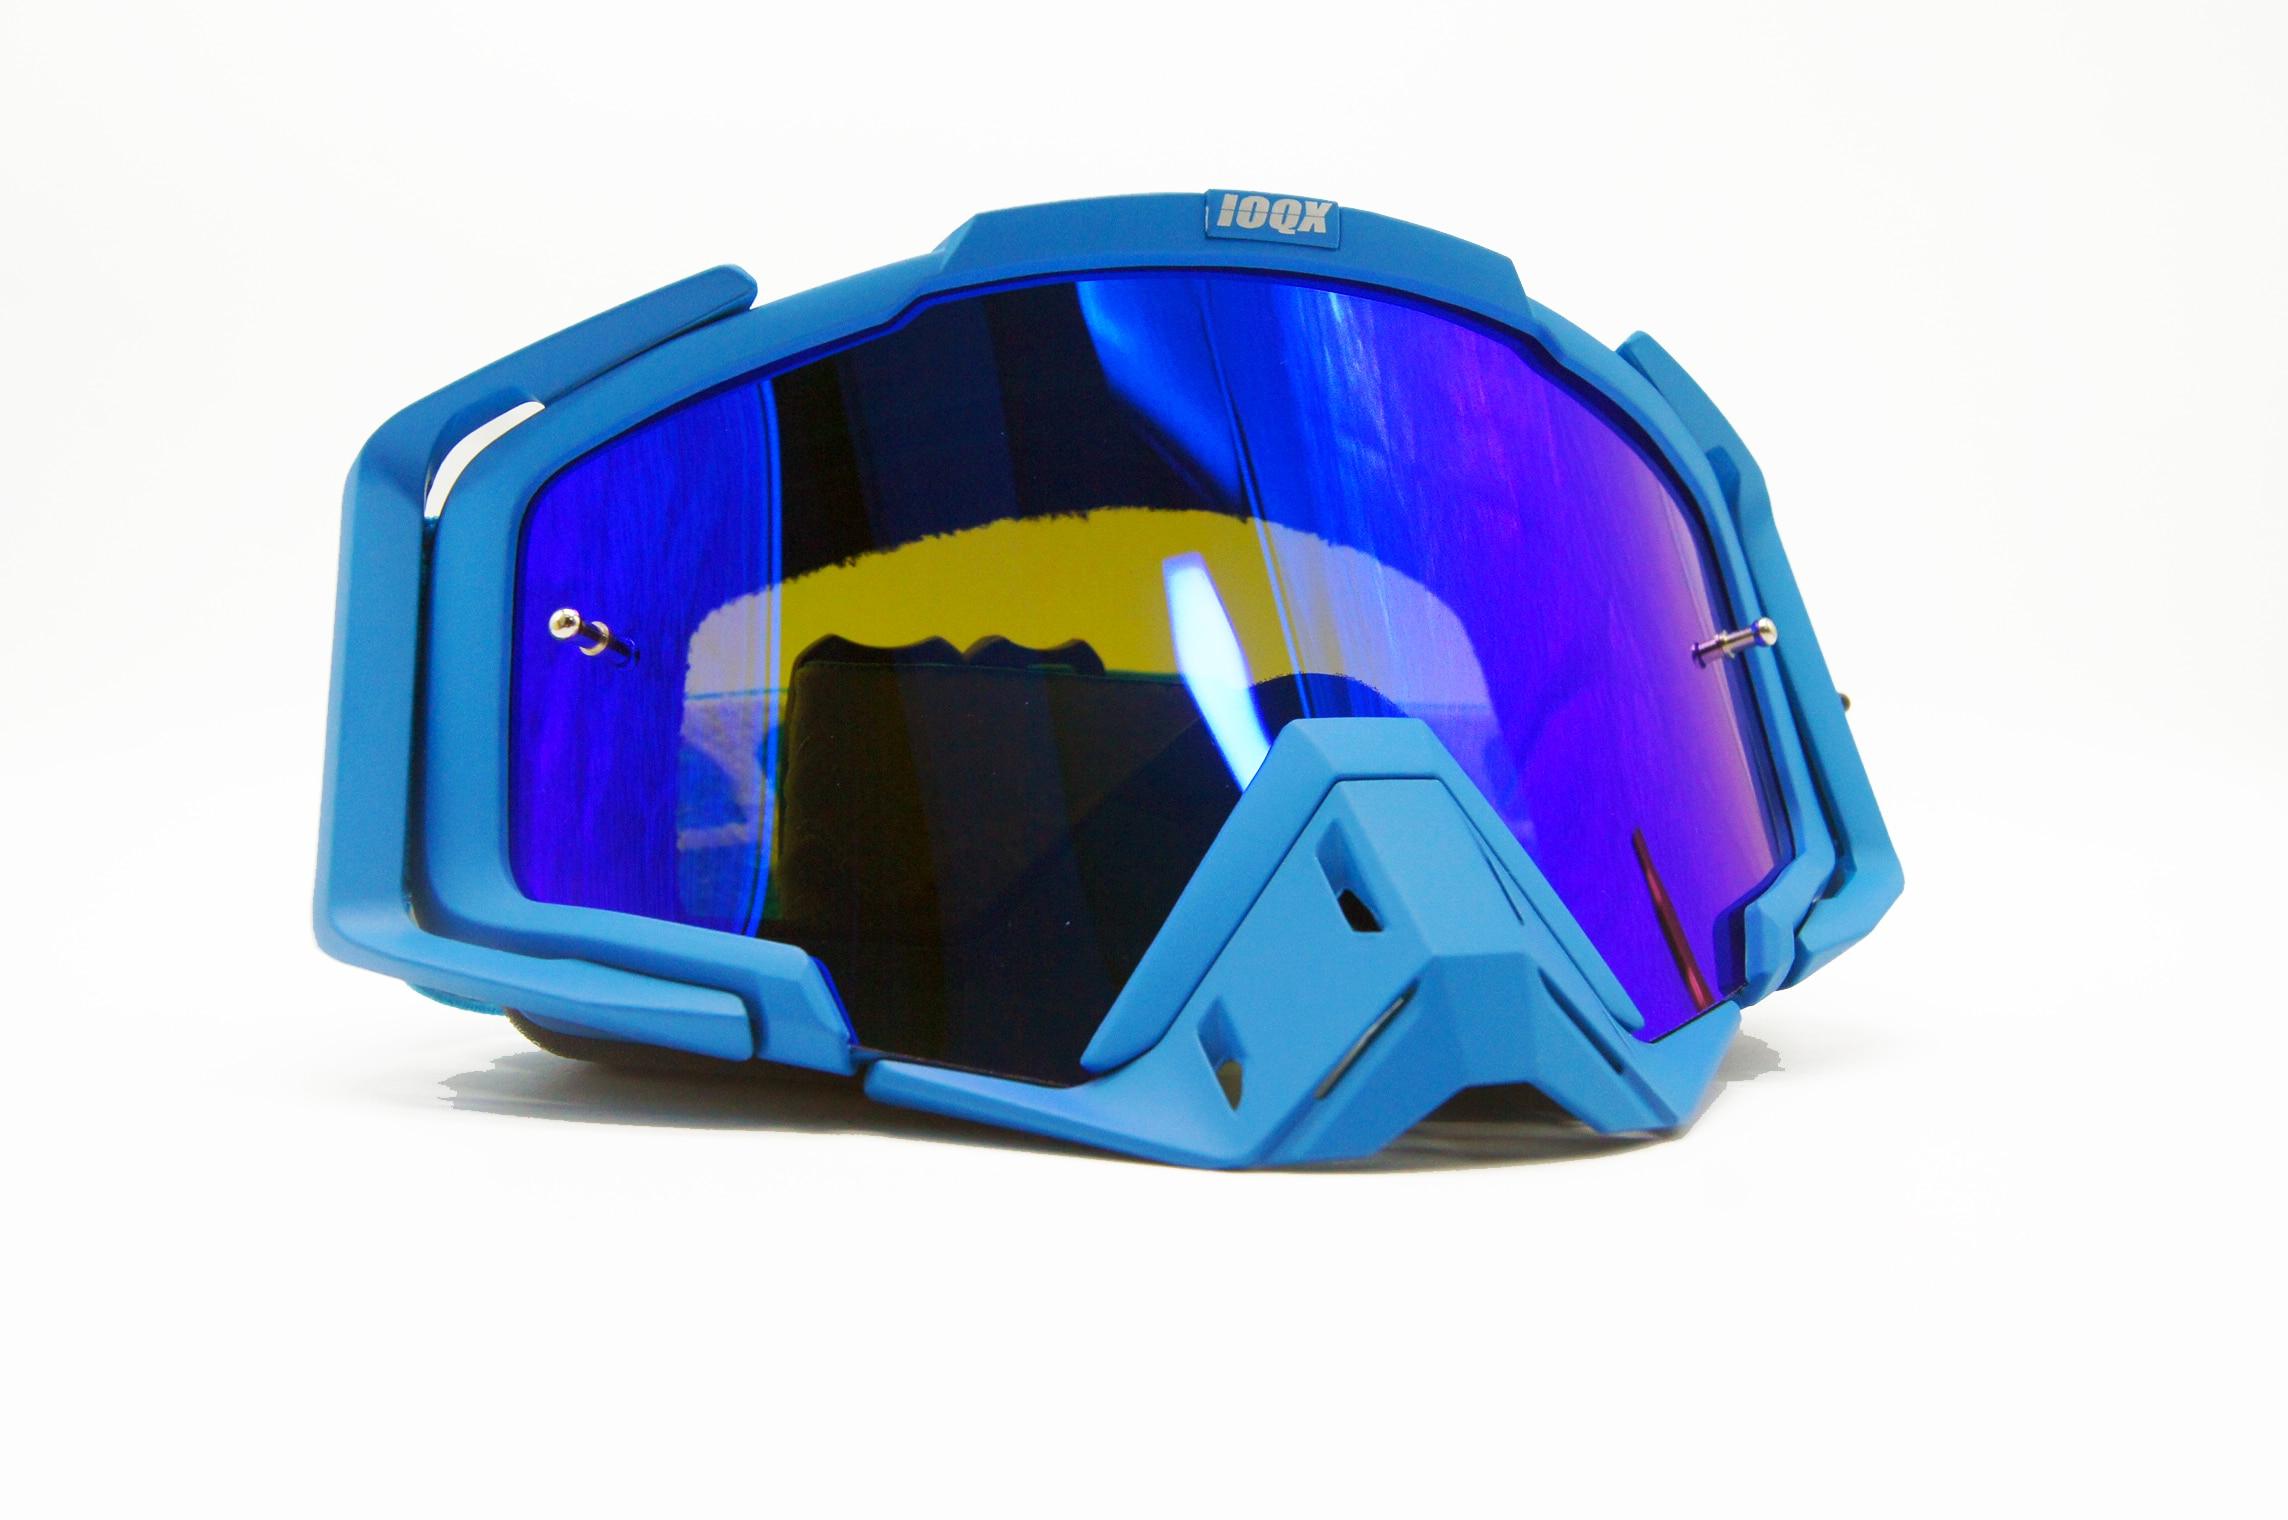 IOQX Motocross Helmet Goggles Atv Off Road Goggles Dirt Bike Glasses Dustproof Gafas Moto Cross Brillen Motorcycle Glasses enlarge